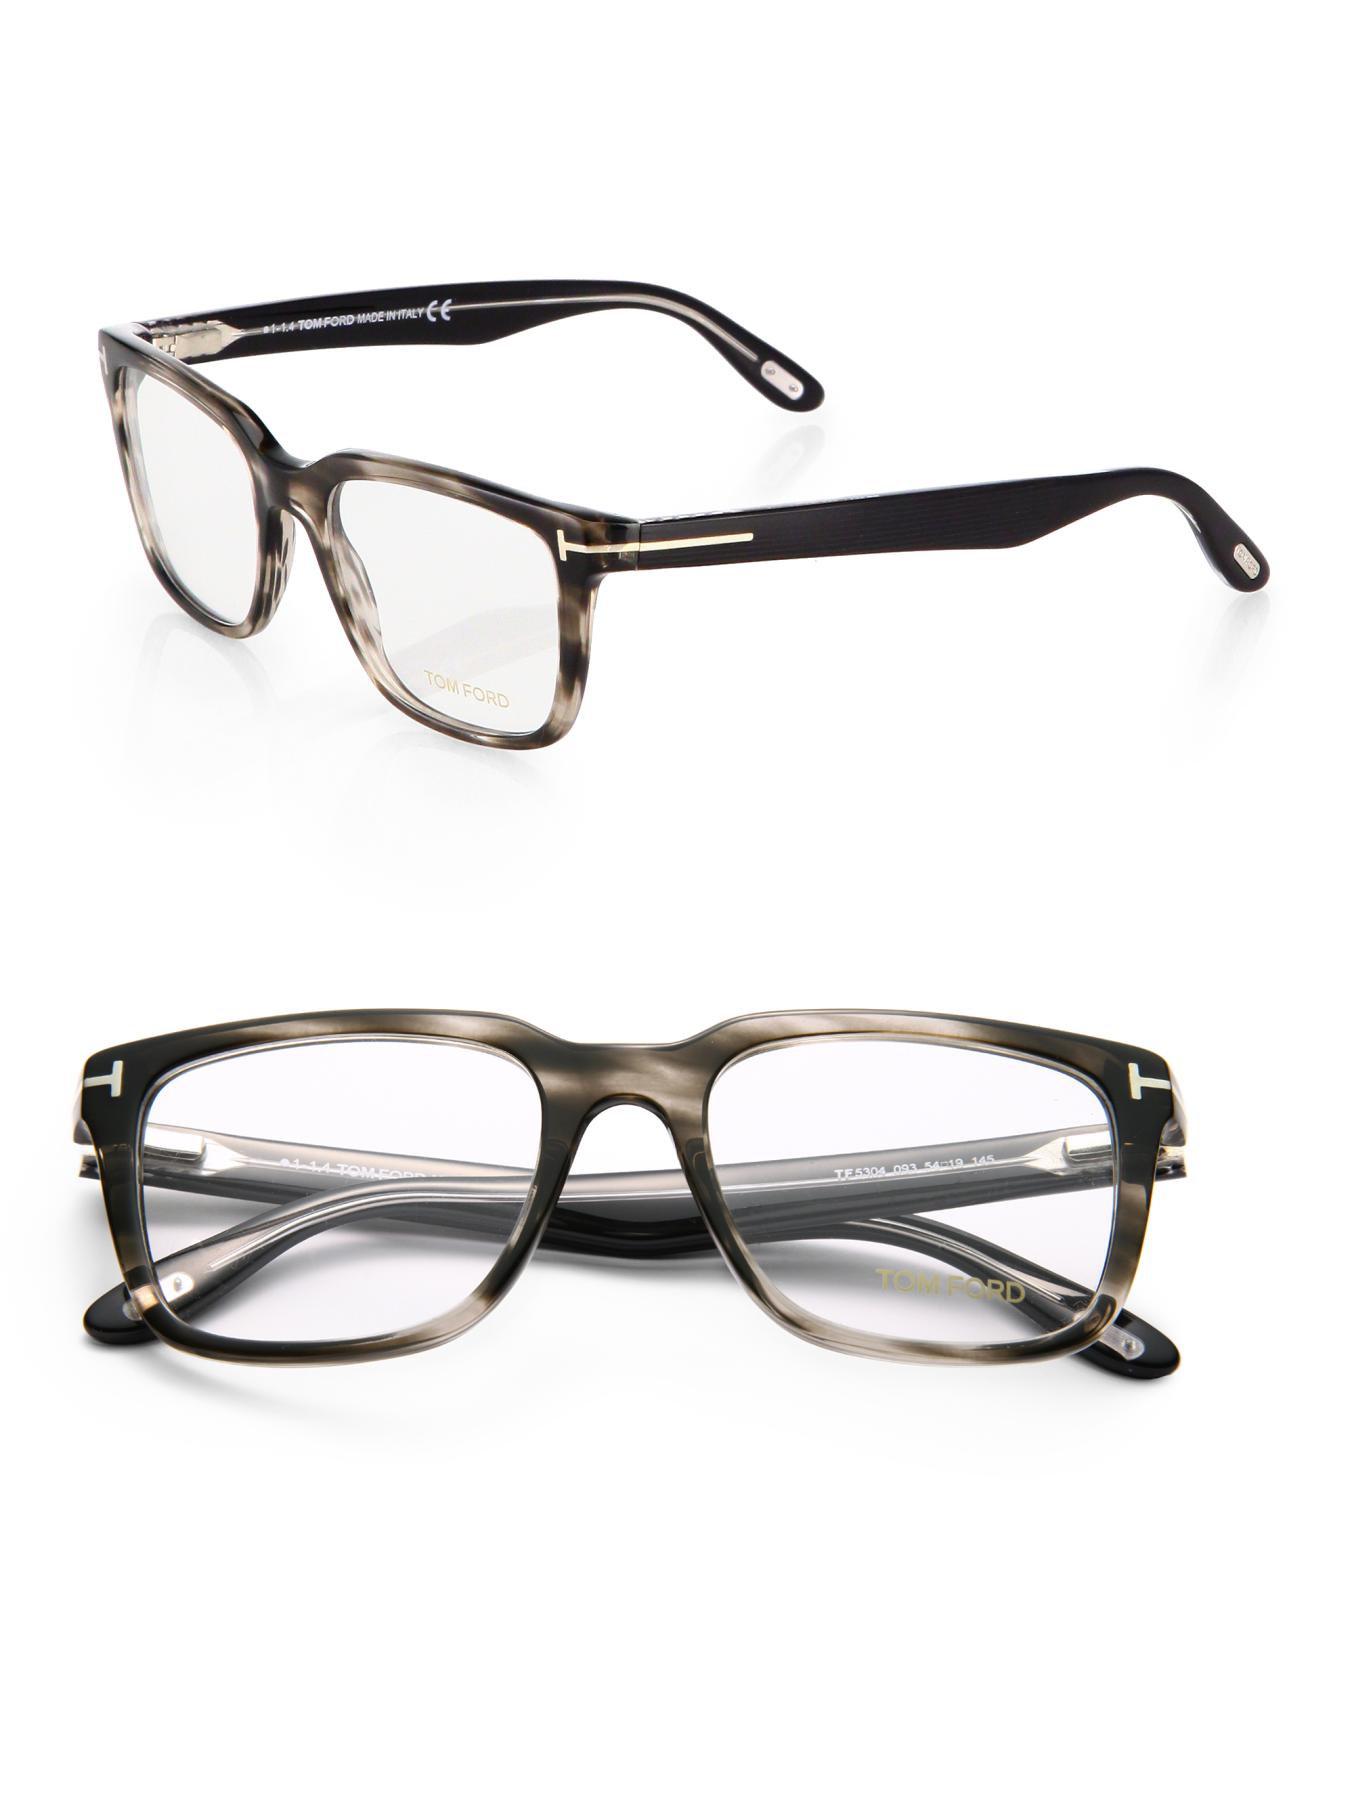 Lyst - Tom Ford Square Optical Frames in Gray for Men